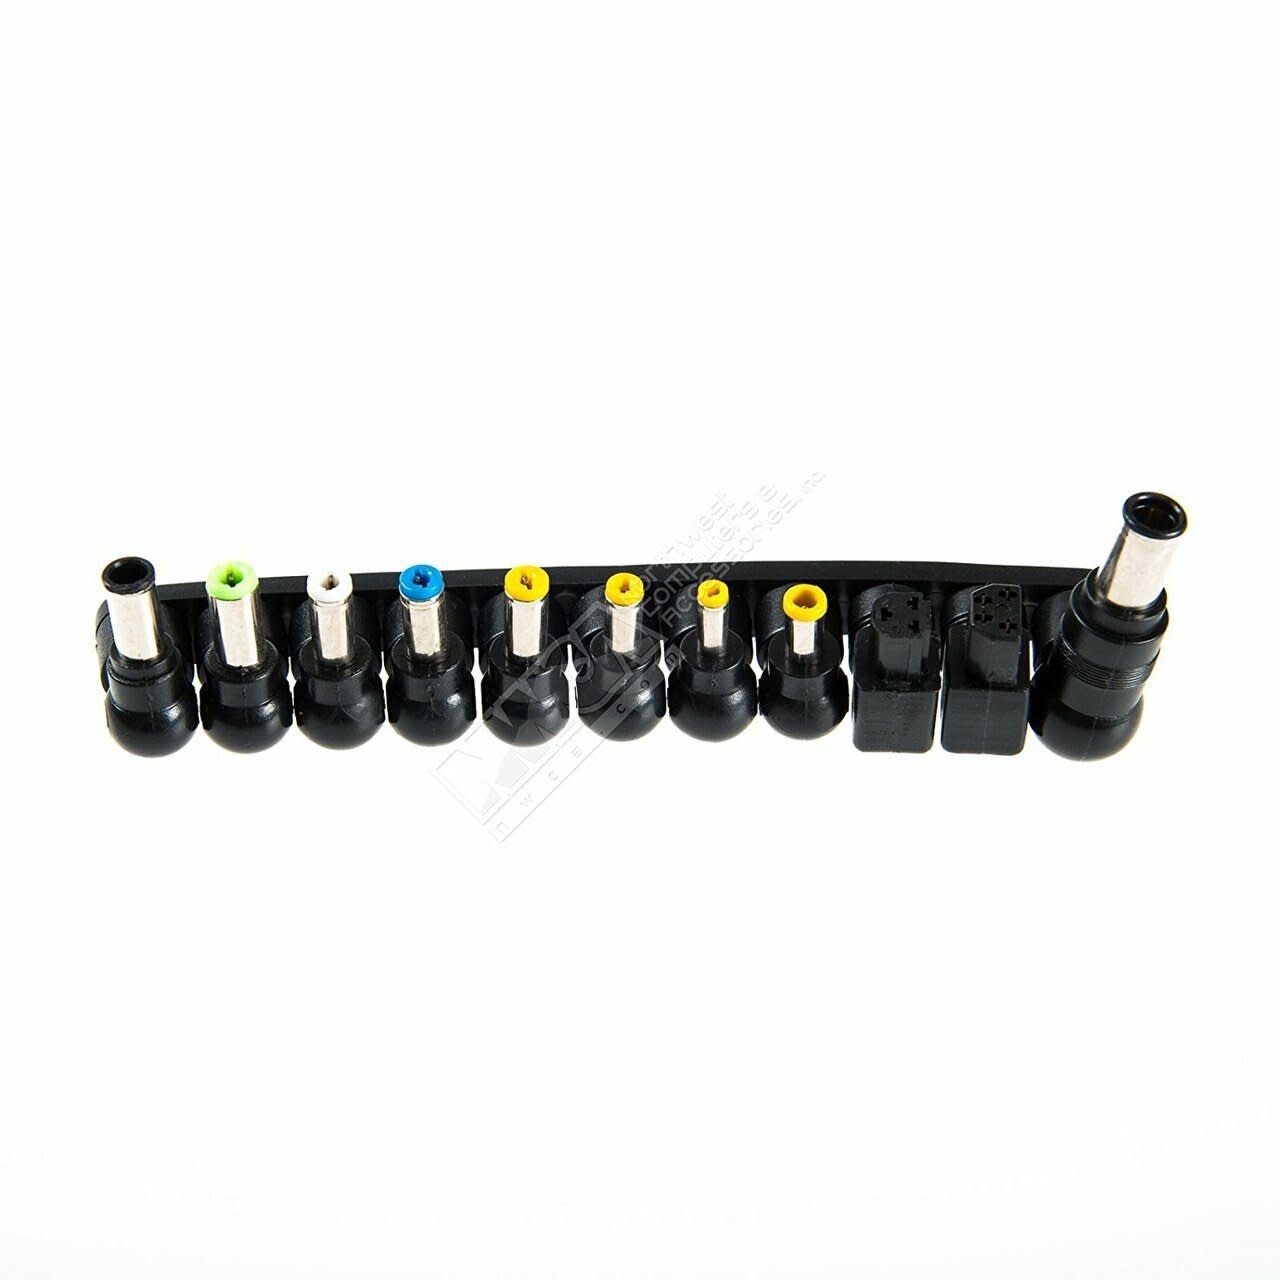 Prudent Way Universal 90W AC Power Adapter